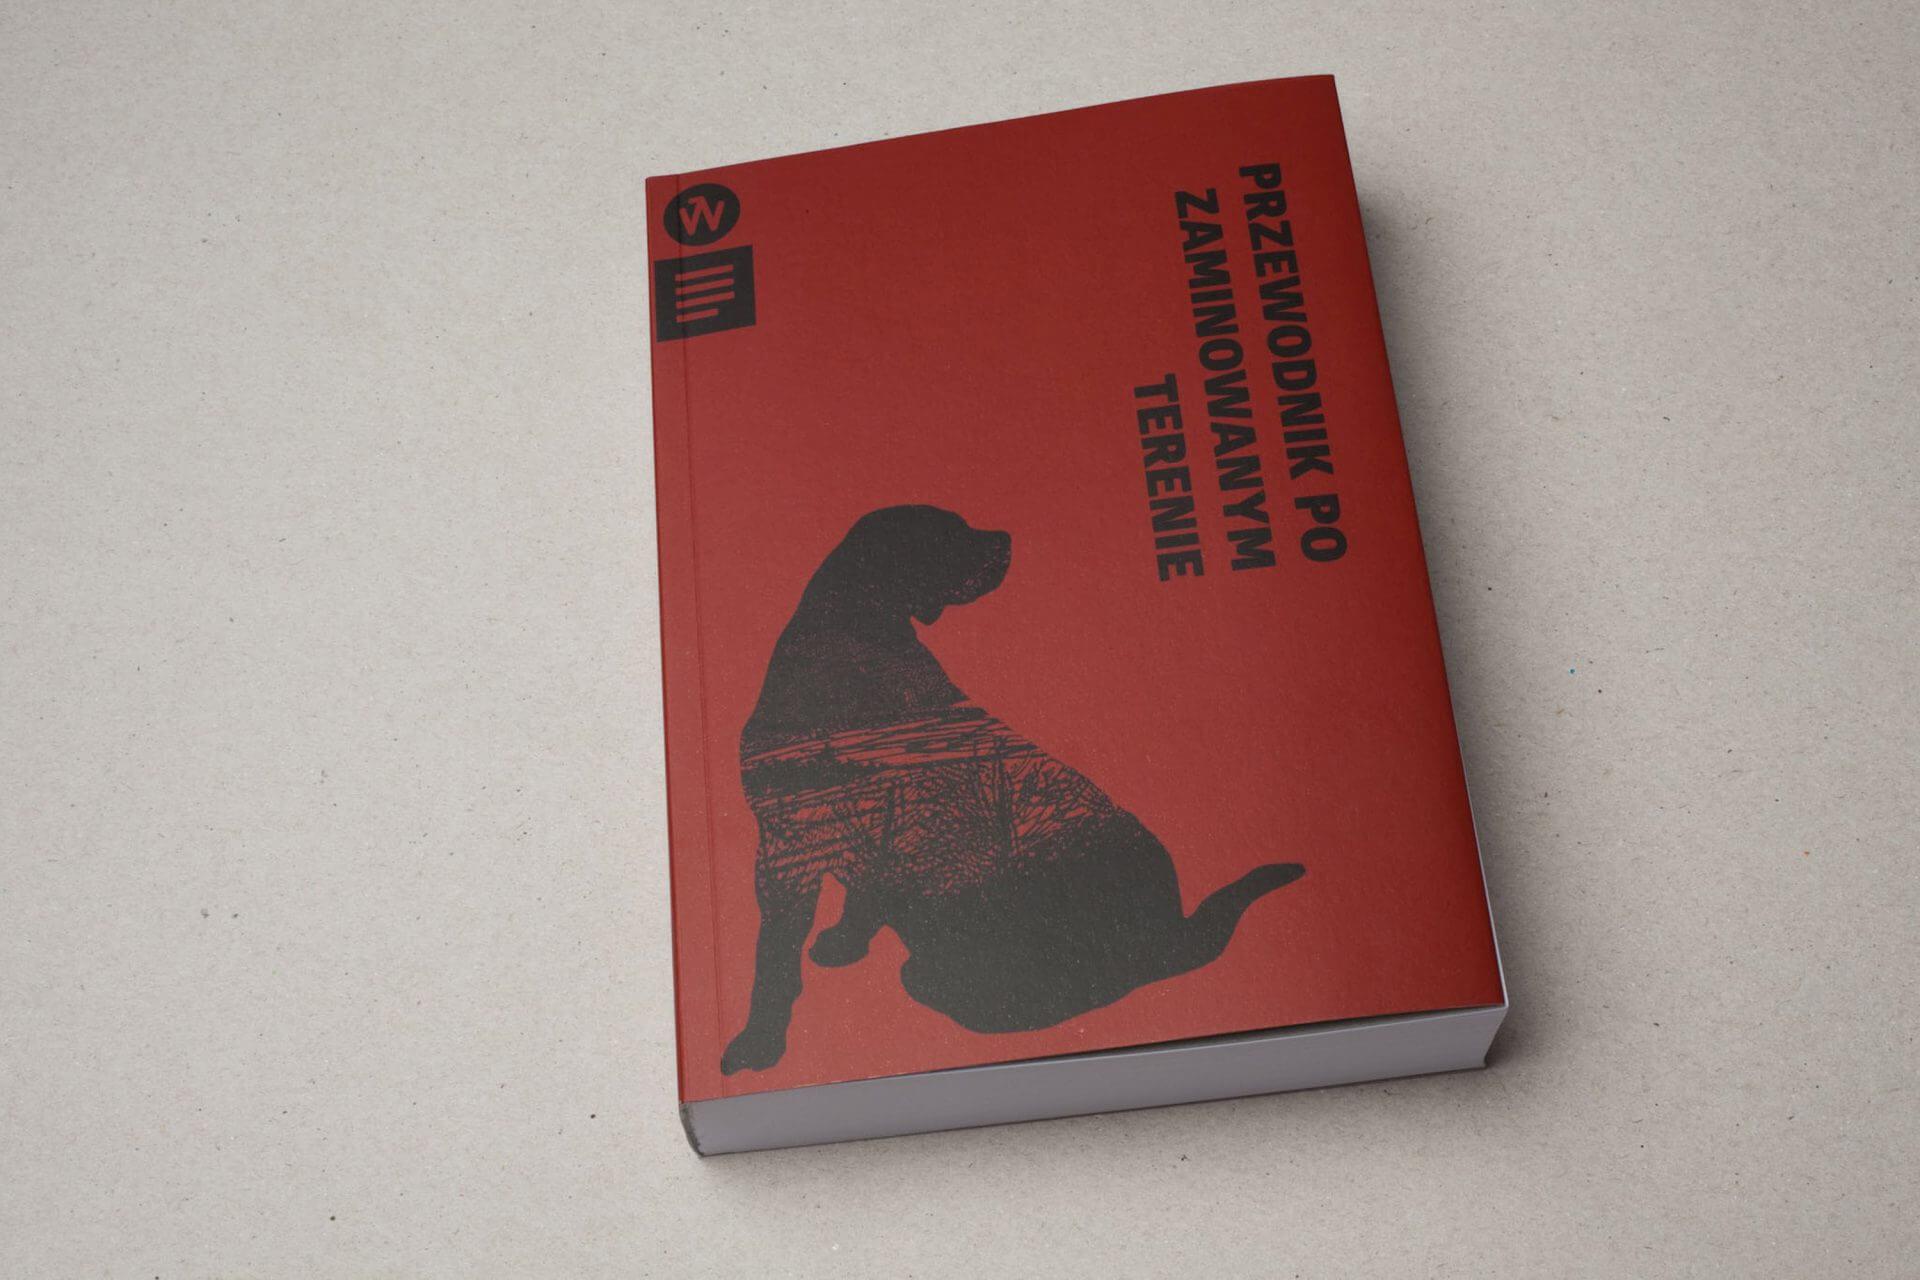 Helikopter - front książki